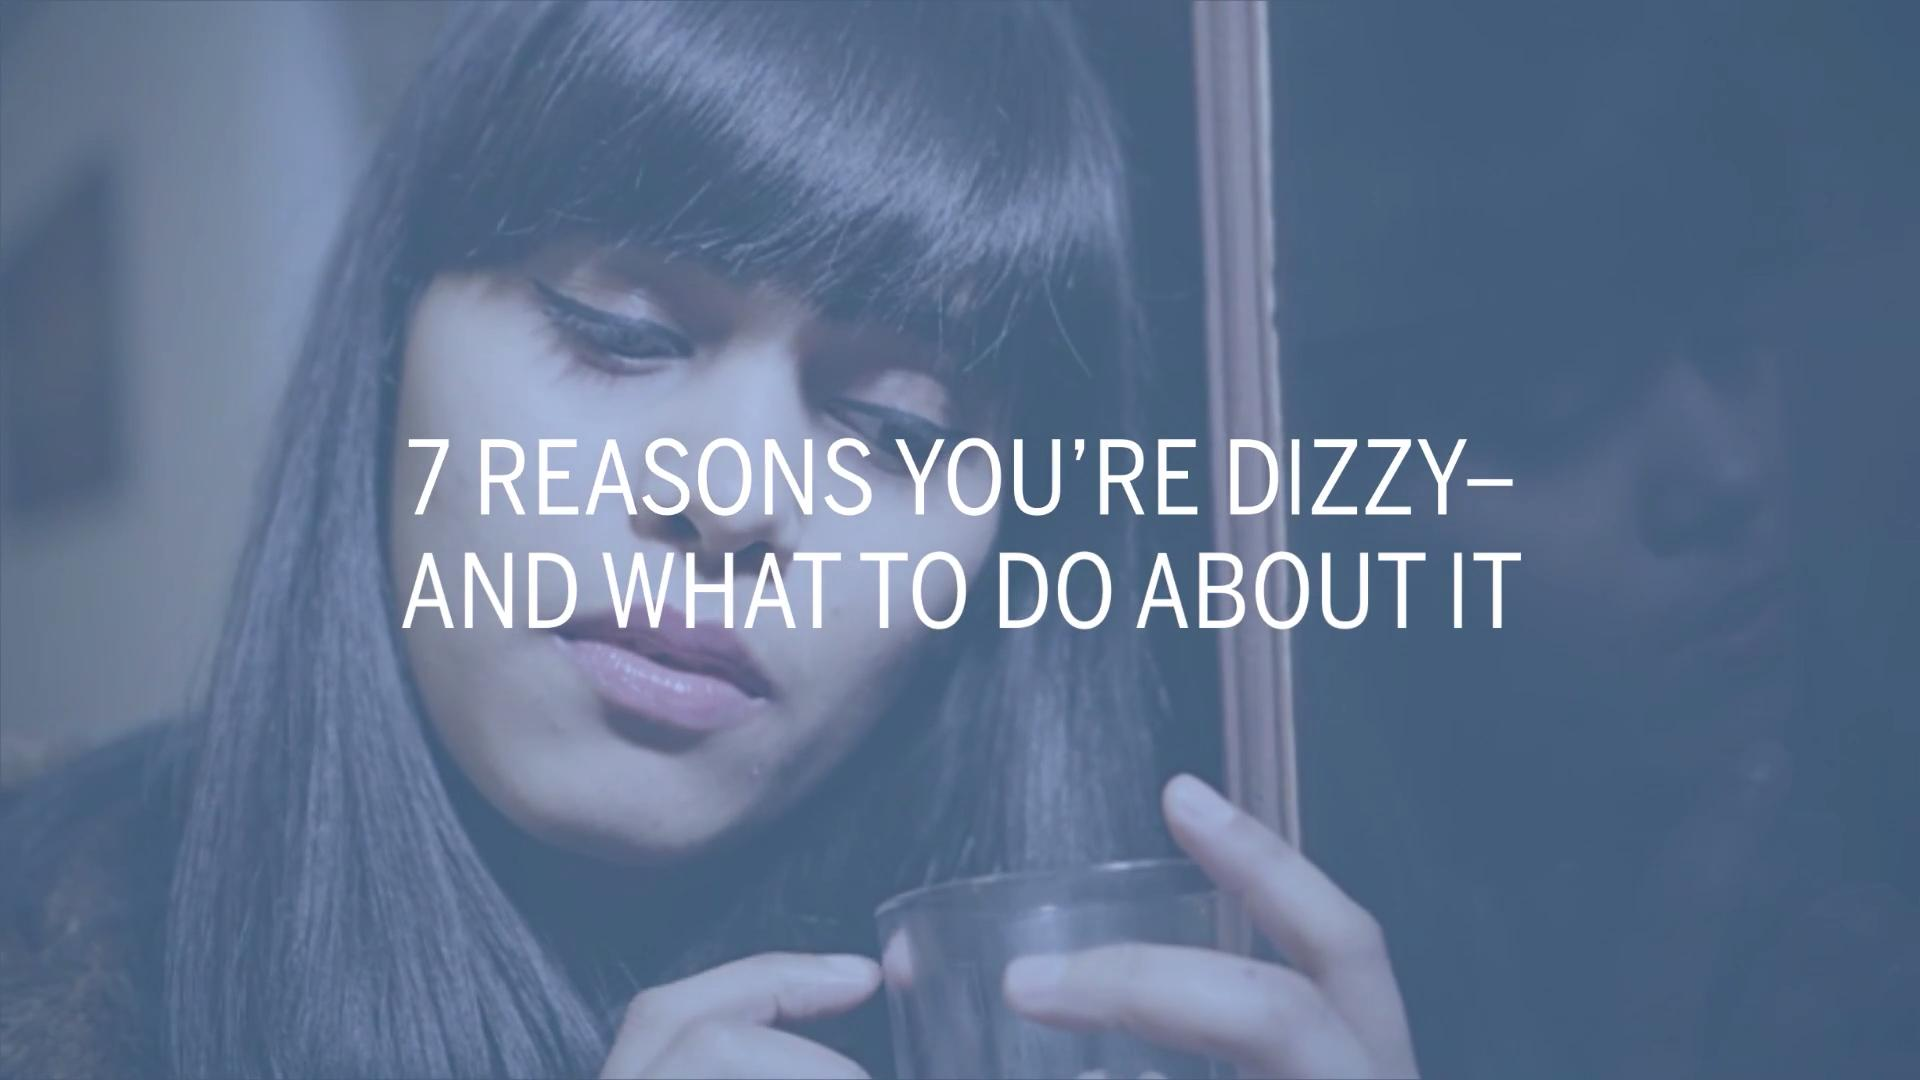 Why am I dizzy?